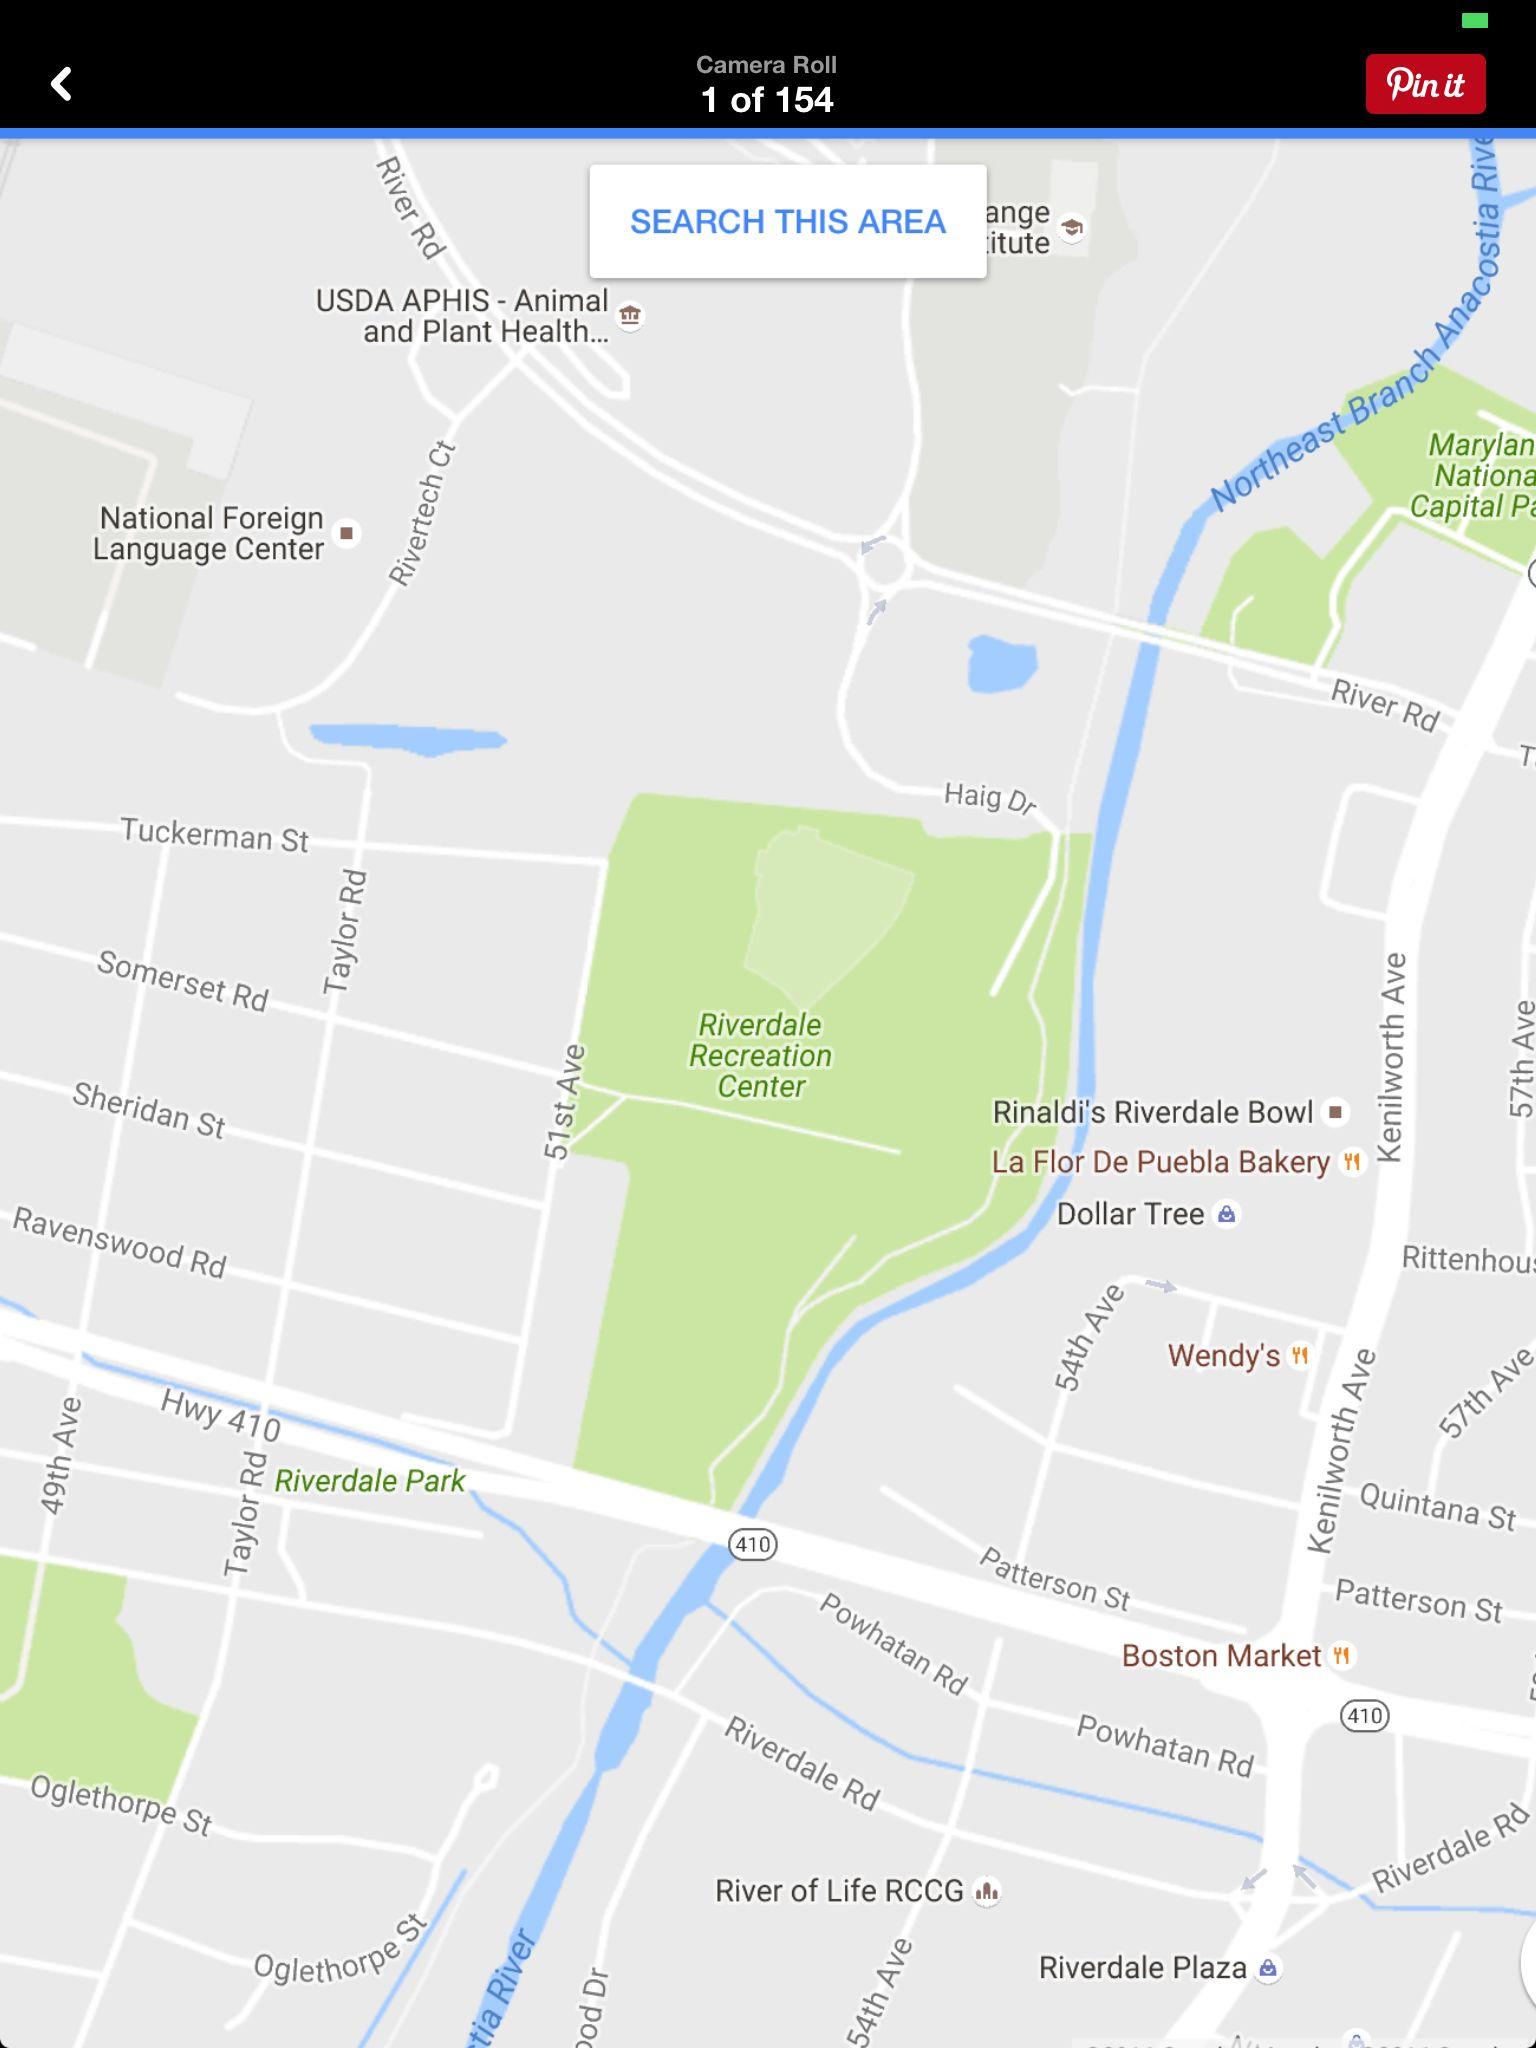 Jynx as of 9216 riverdale recreational center